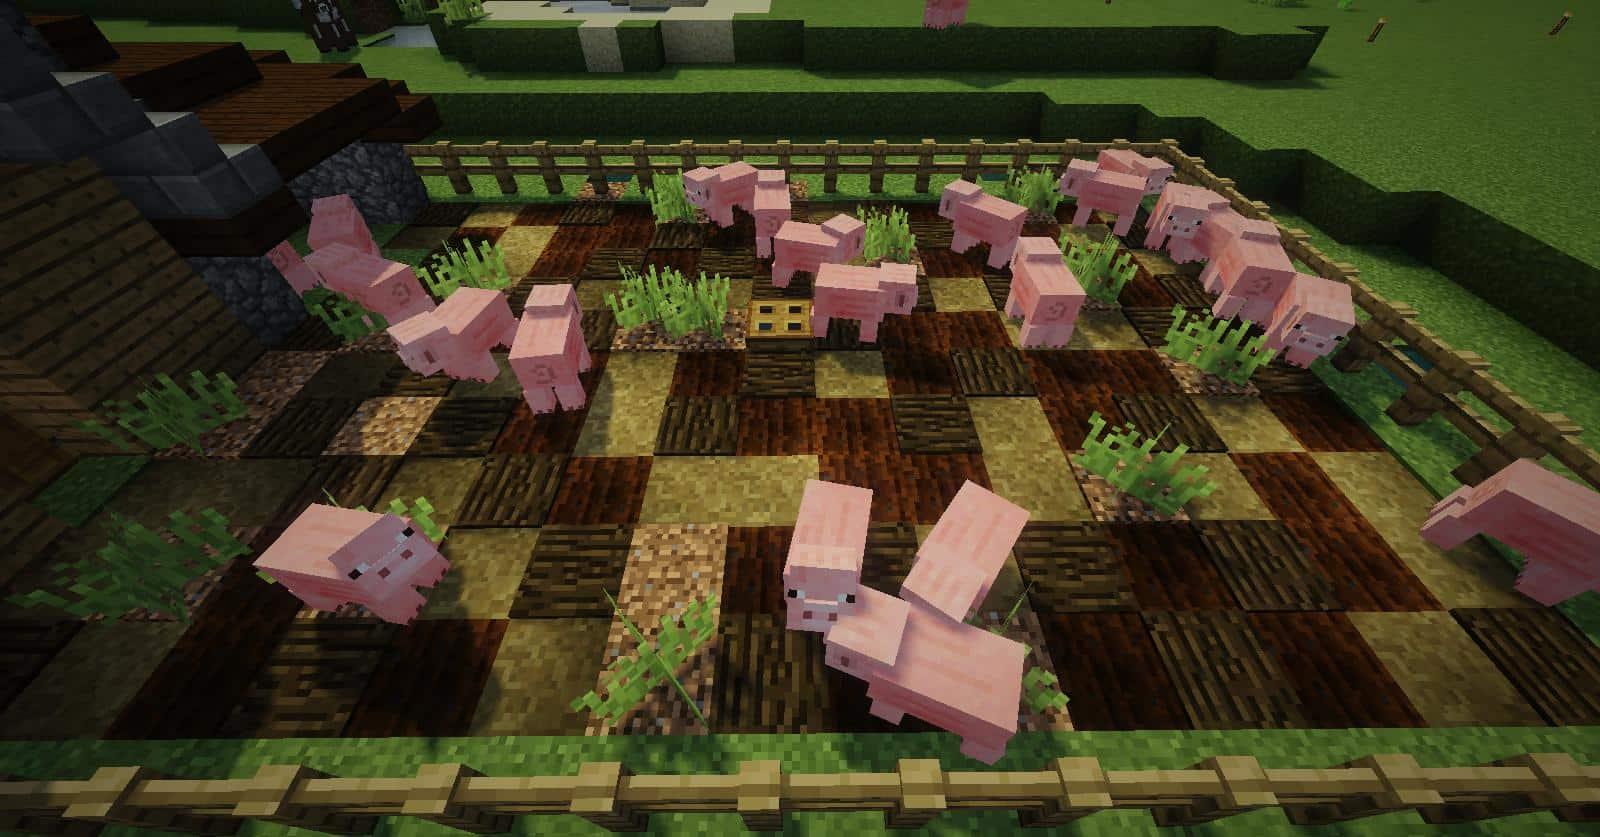 How it looks in vanilla minecraft detail building ideas pig pen farm